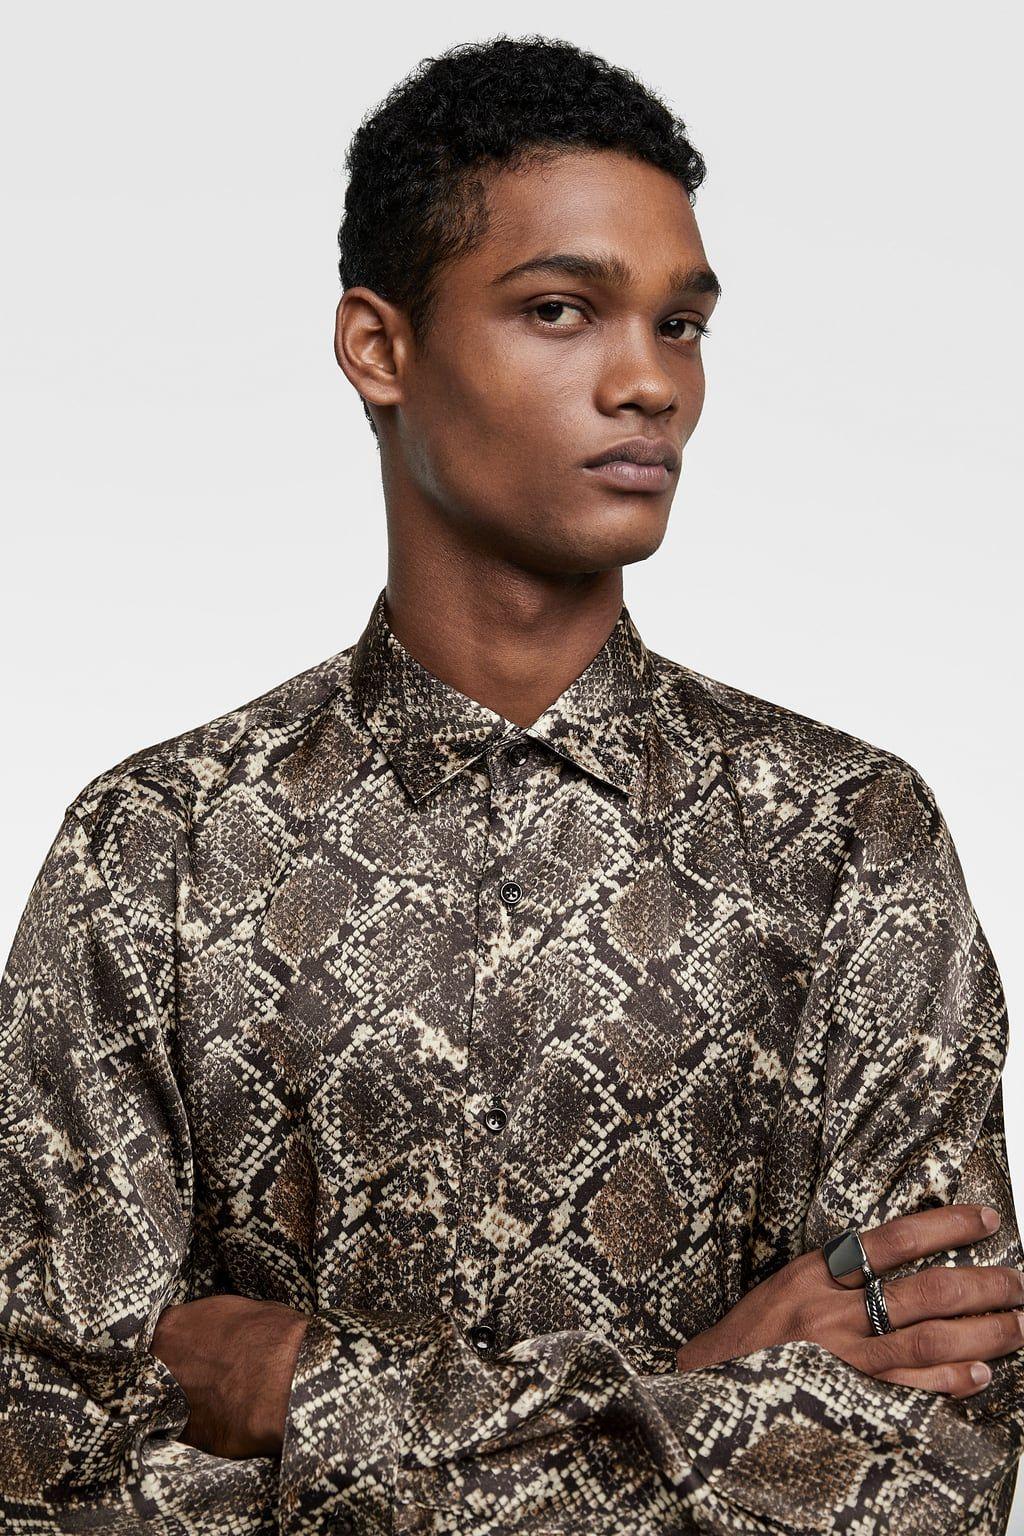 769eb4fd5b0ef0 SNAKESKIN PRINT SATIN SHIRT from Zara | Snakeskin Shirts for Men in ...